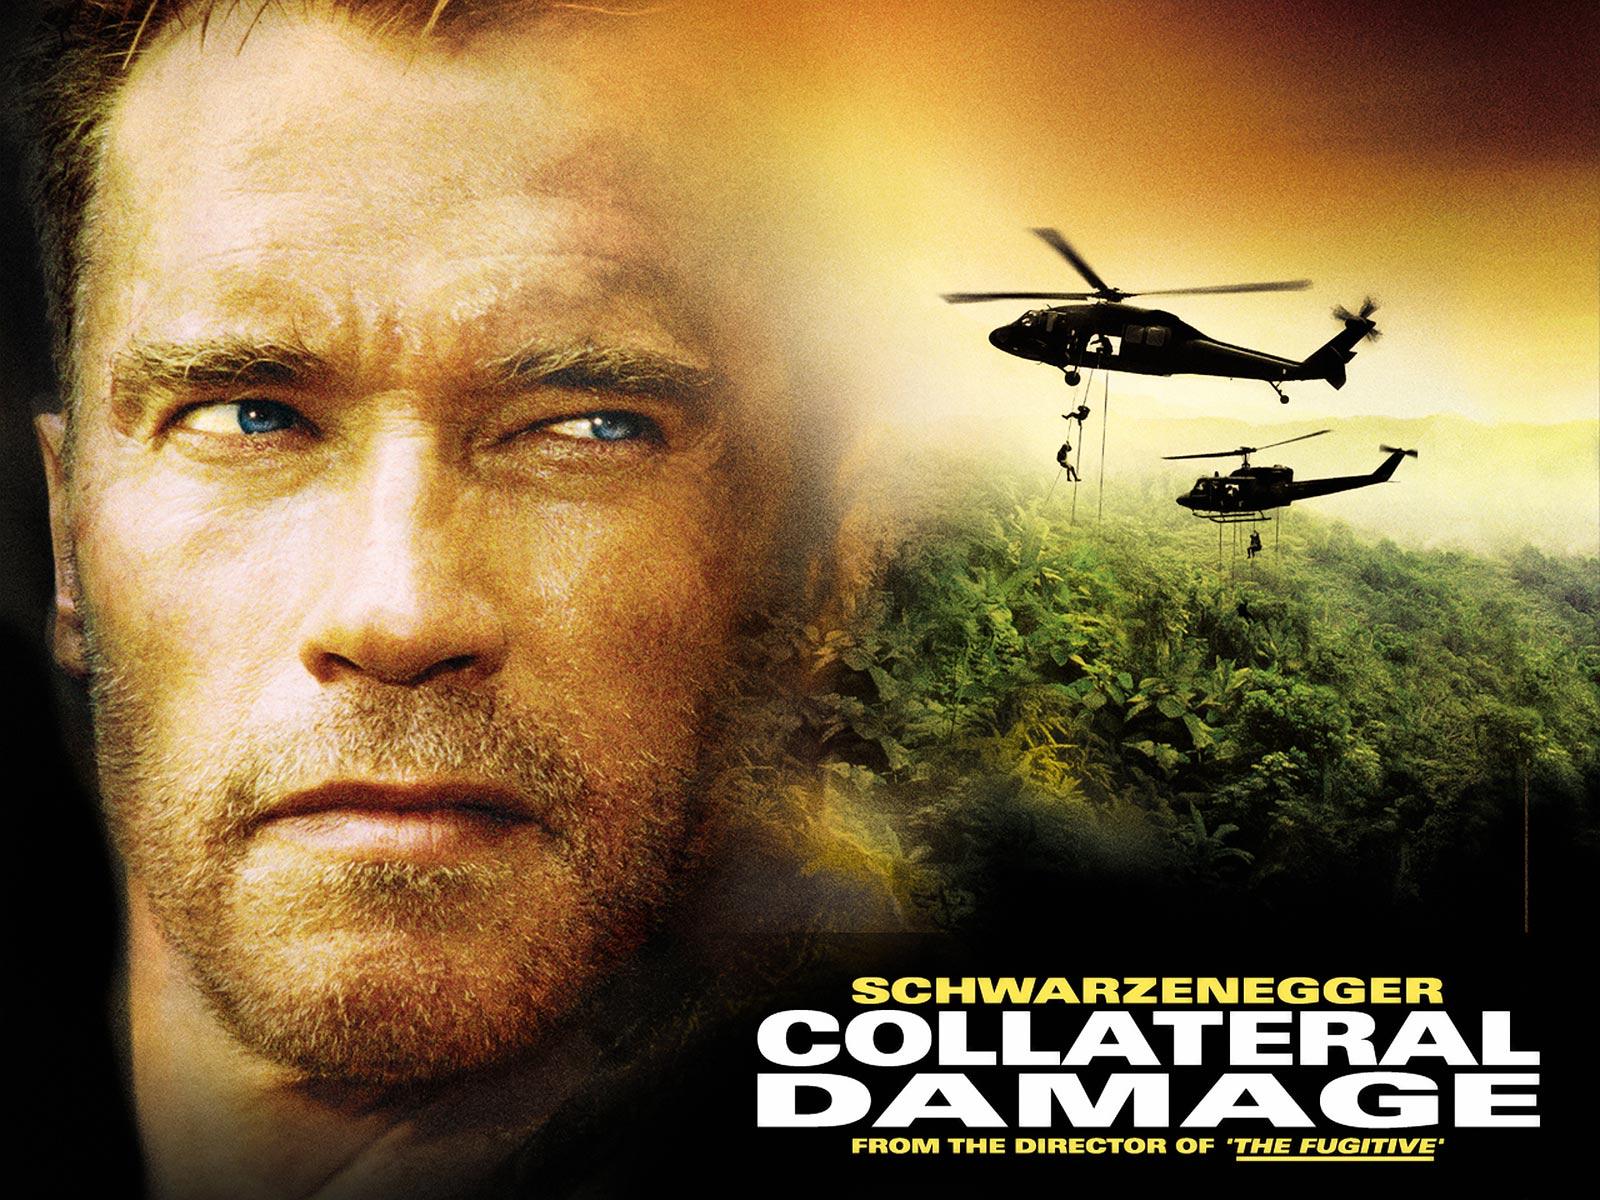 http://1.bp.blogspot.com/-bMrHbGGfAHs/T_qD_H3BcnI/AAAAAAAADBc/-4CpoqzyPEE/s1600/423469-collateral_damage__2002__arnold_schwarzenegger__elias_koteas.jpg